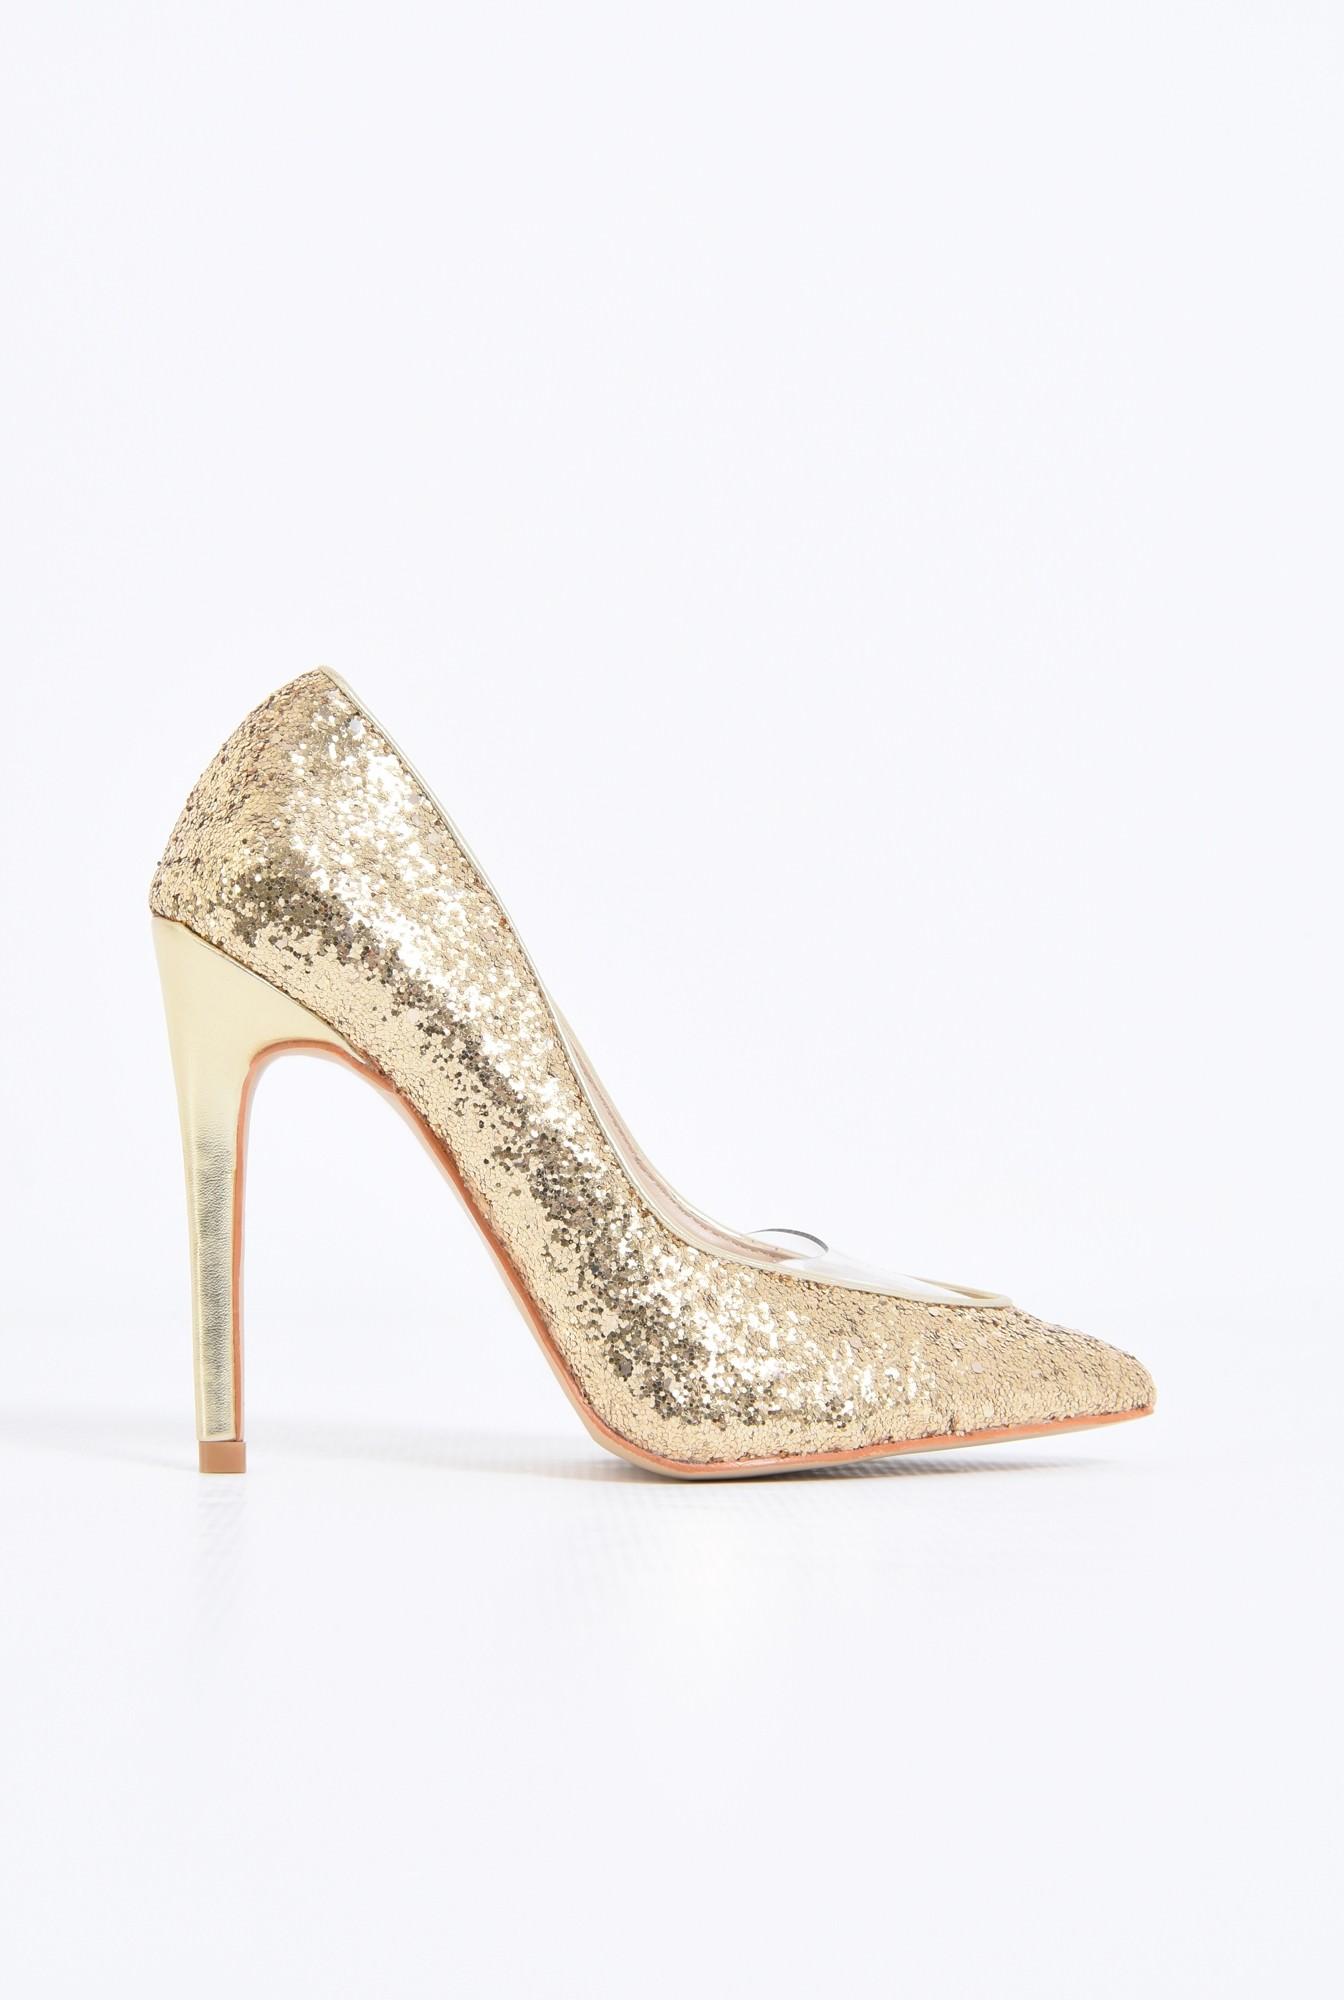 pantofi eleganti, auriu, stiletto, glitter